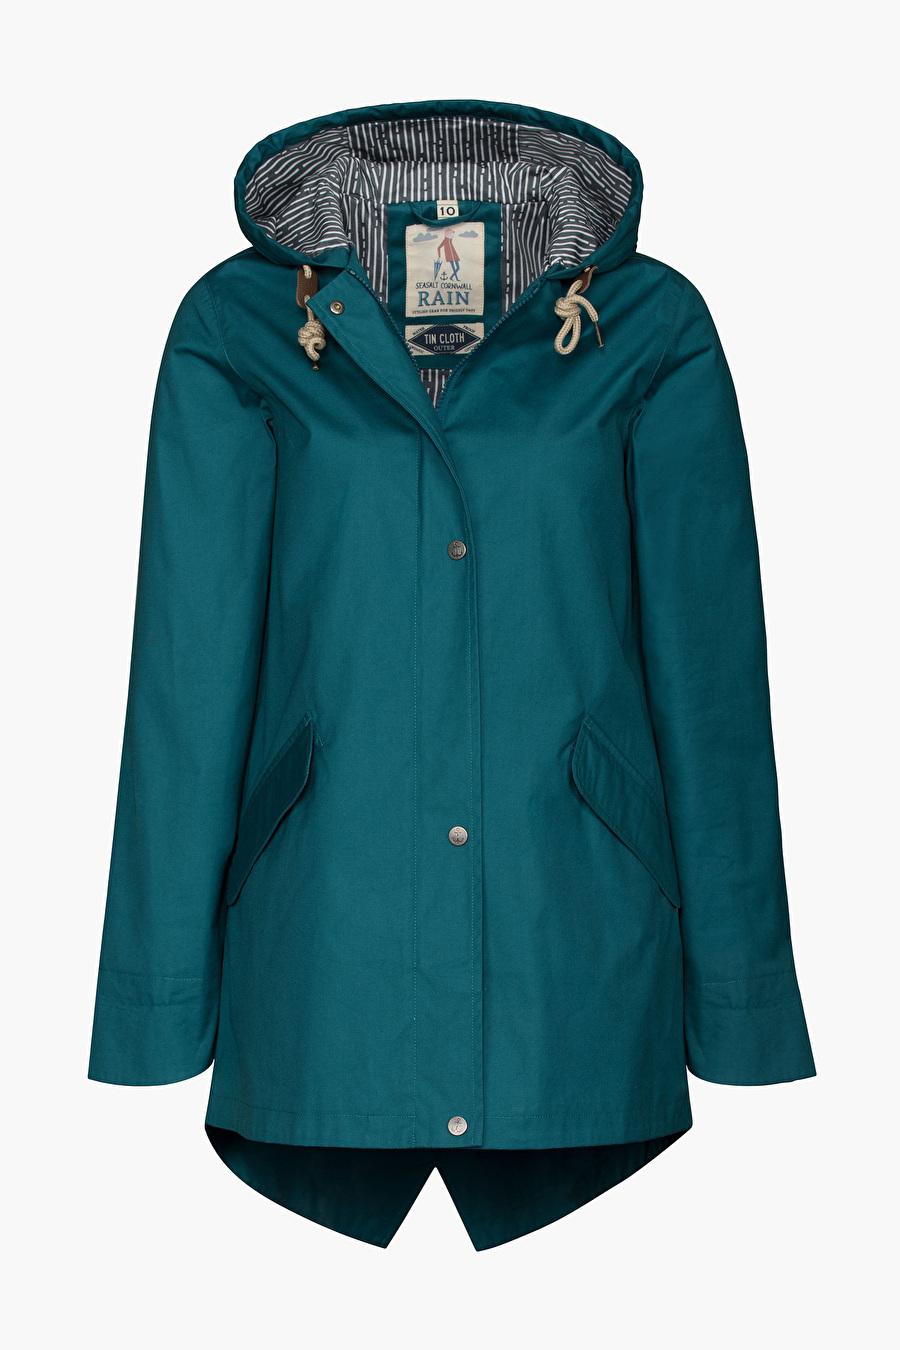 bowsprit jacket seasalt